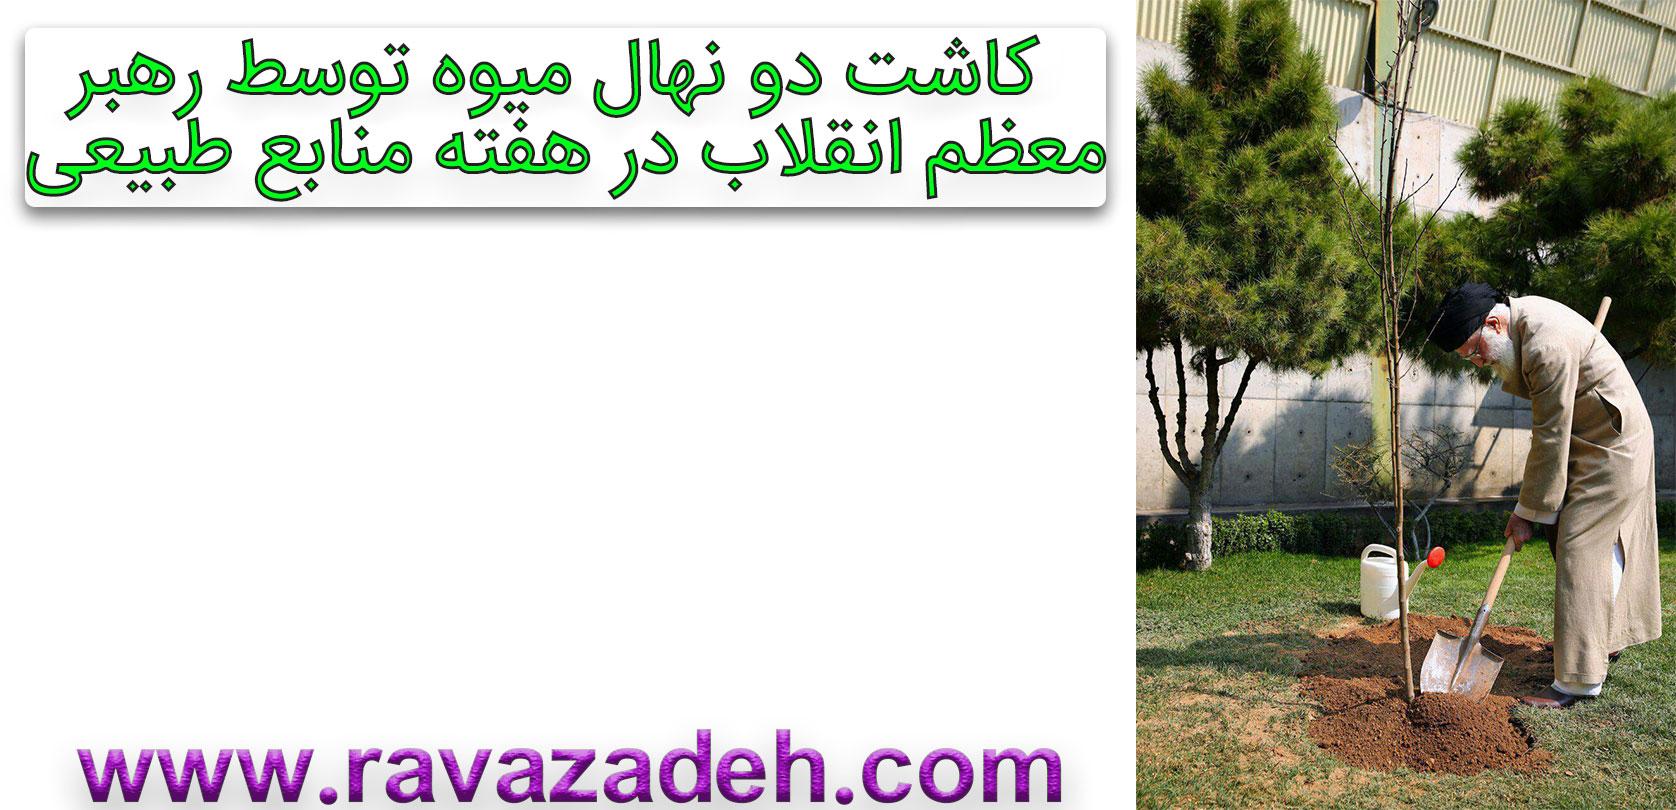 Photo of کاشت دو نهال میوه توسط رهبر معظم انقلاب در هفته منابع طبیعی+کلیپ تصویری